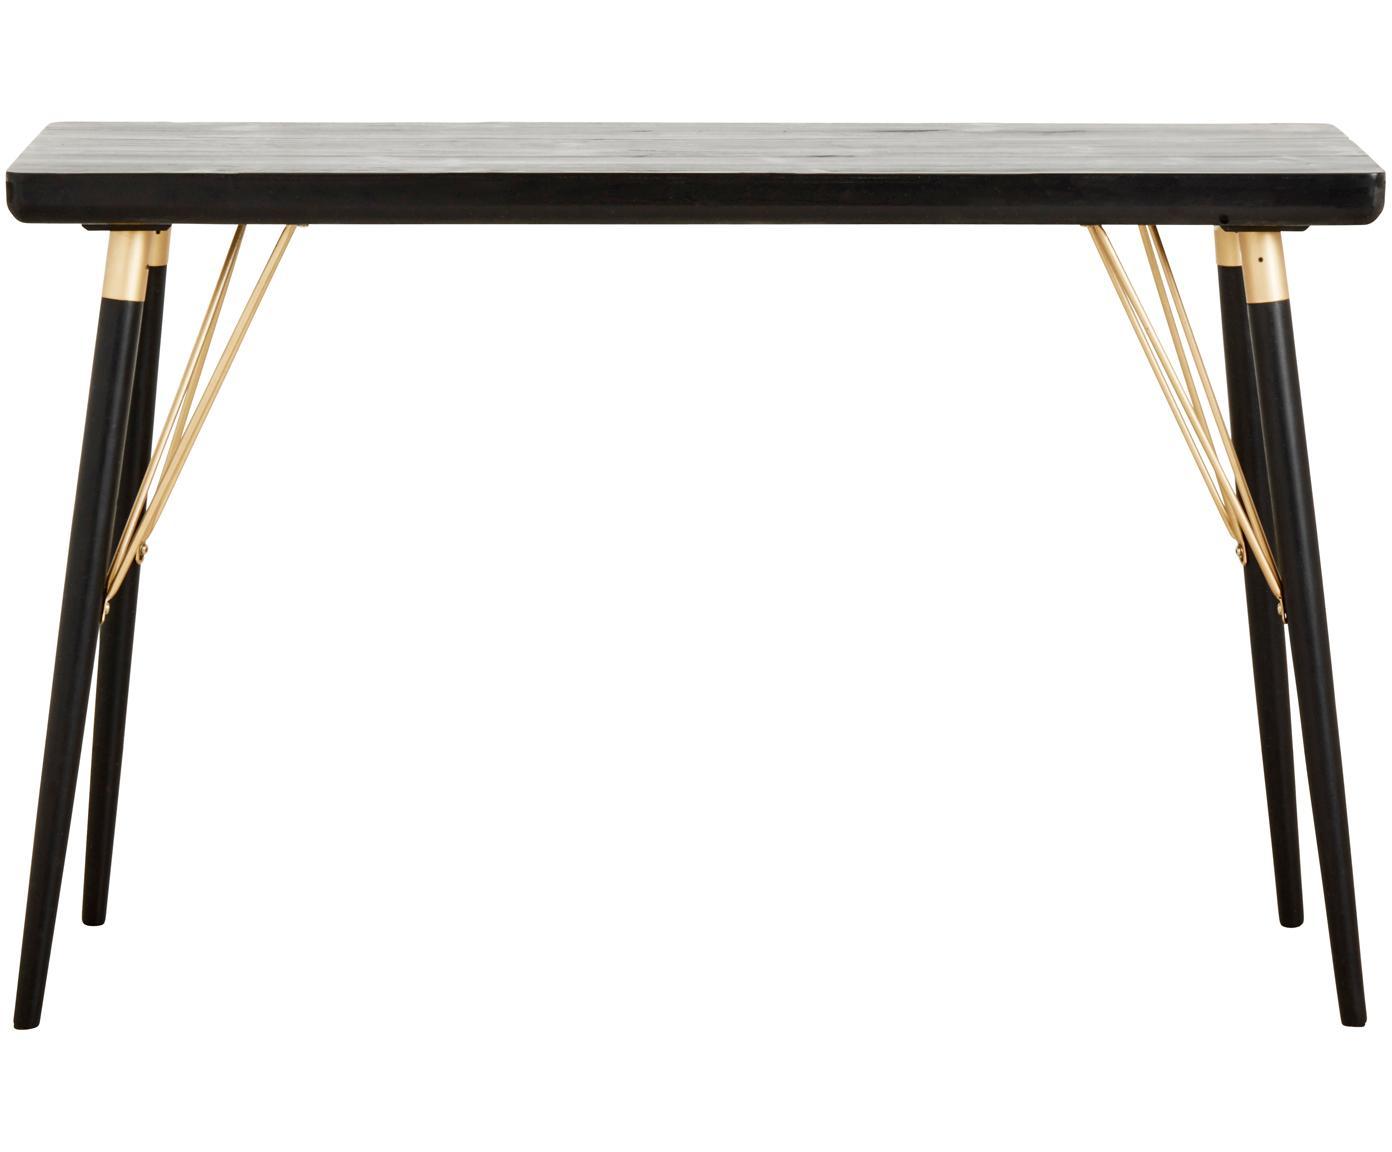 Sidetable Jana met goudkleurige elementen, Plank: MDF, gelakt dennenhoutfin, Poten: gelakt metaal, Zwart, goudkleurig, B 120 x D 40 cm